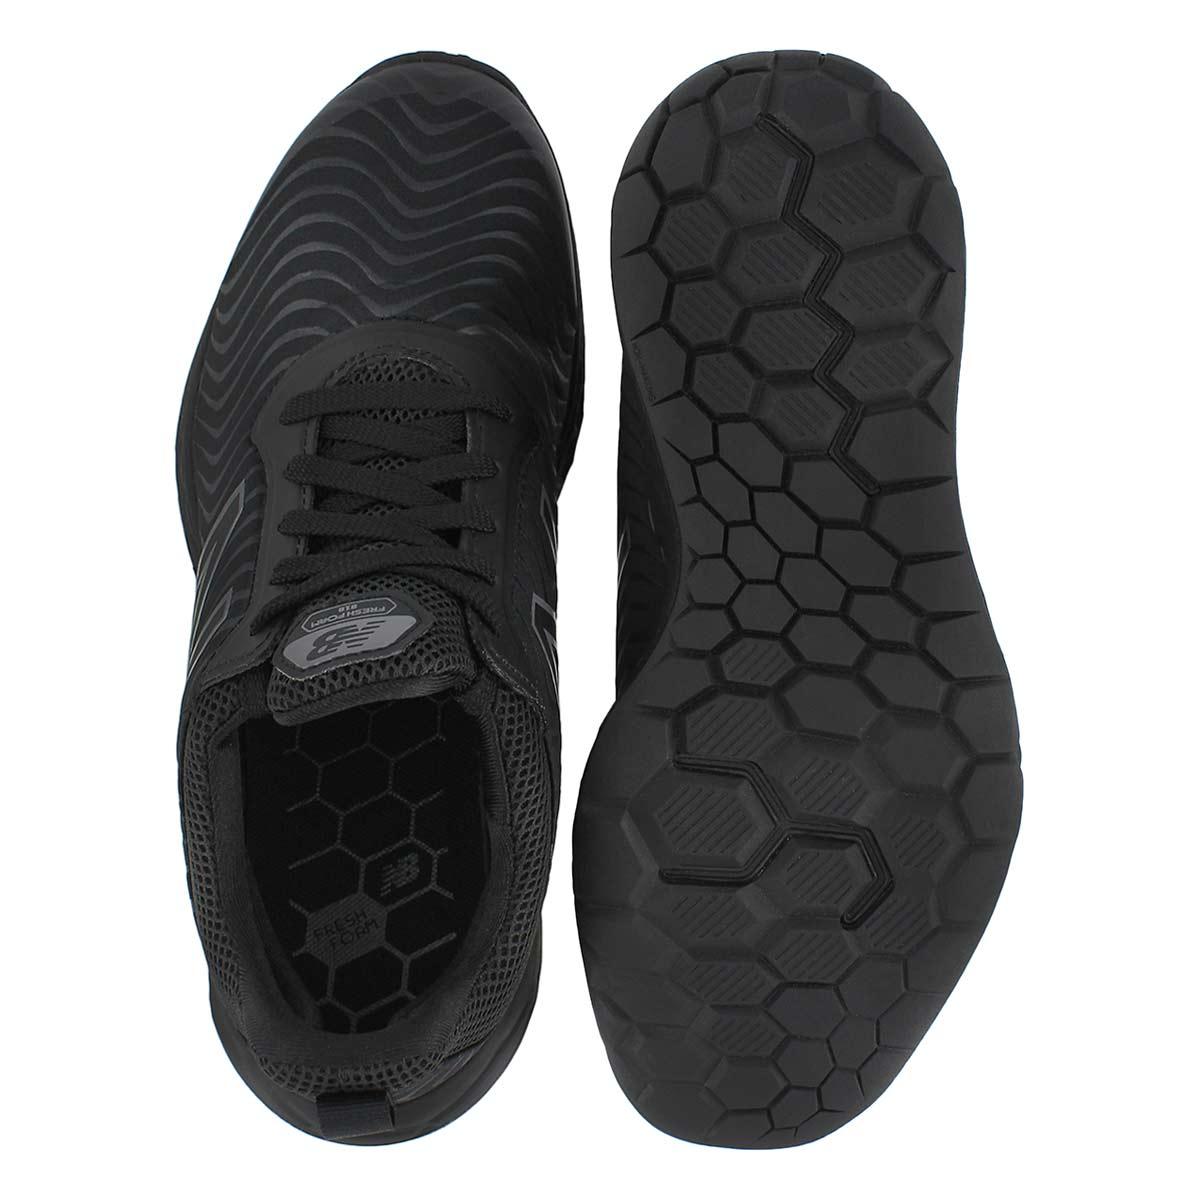 Mns 818 black/magnet running shoe